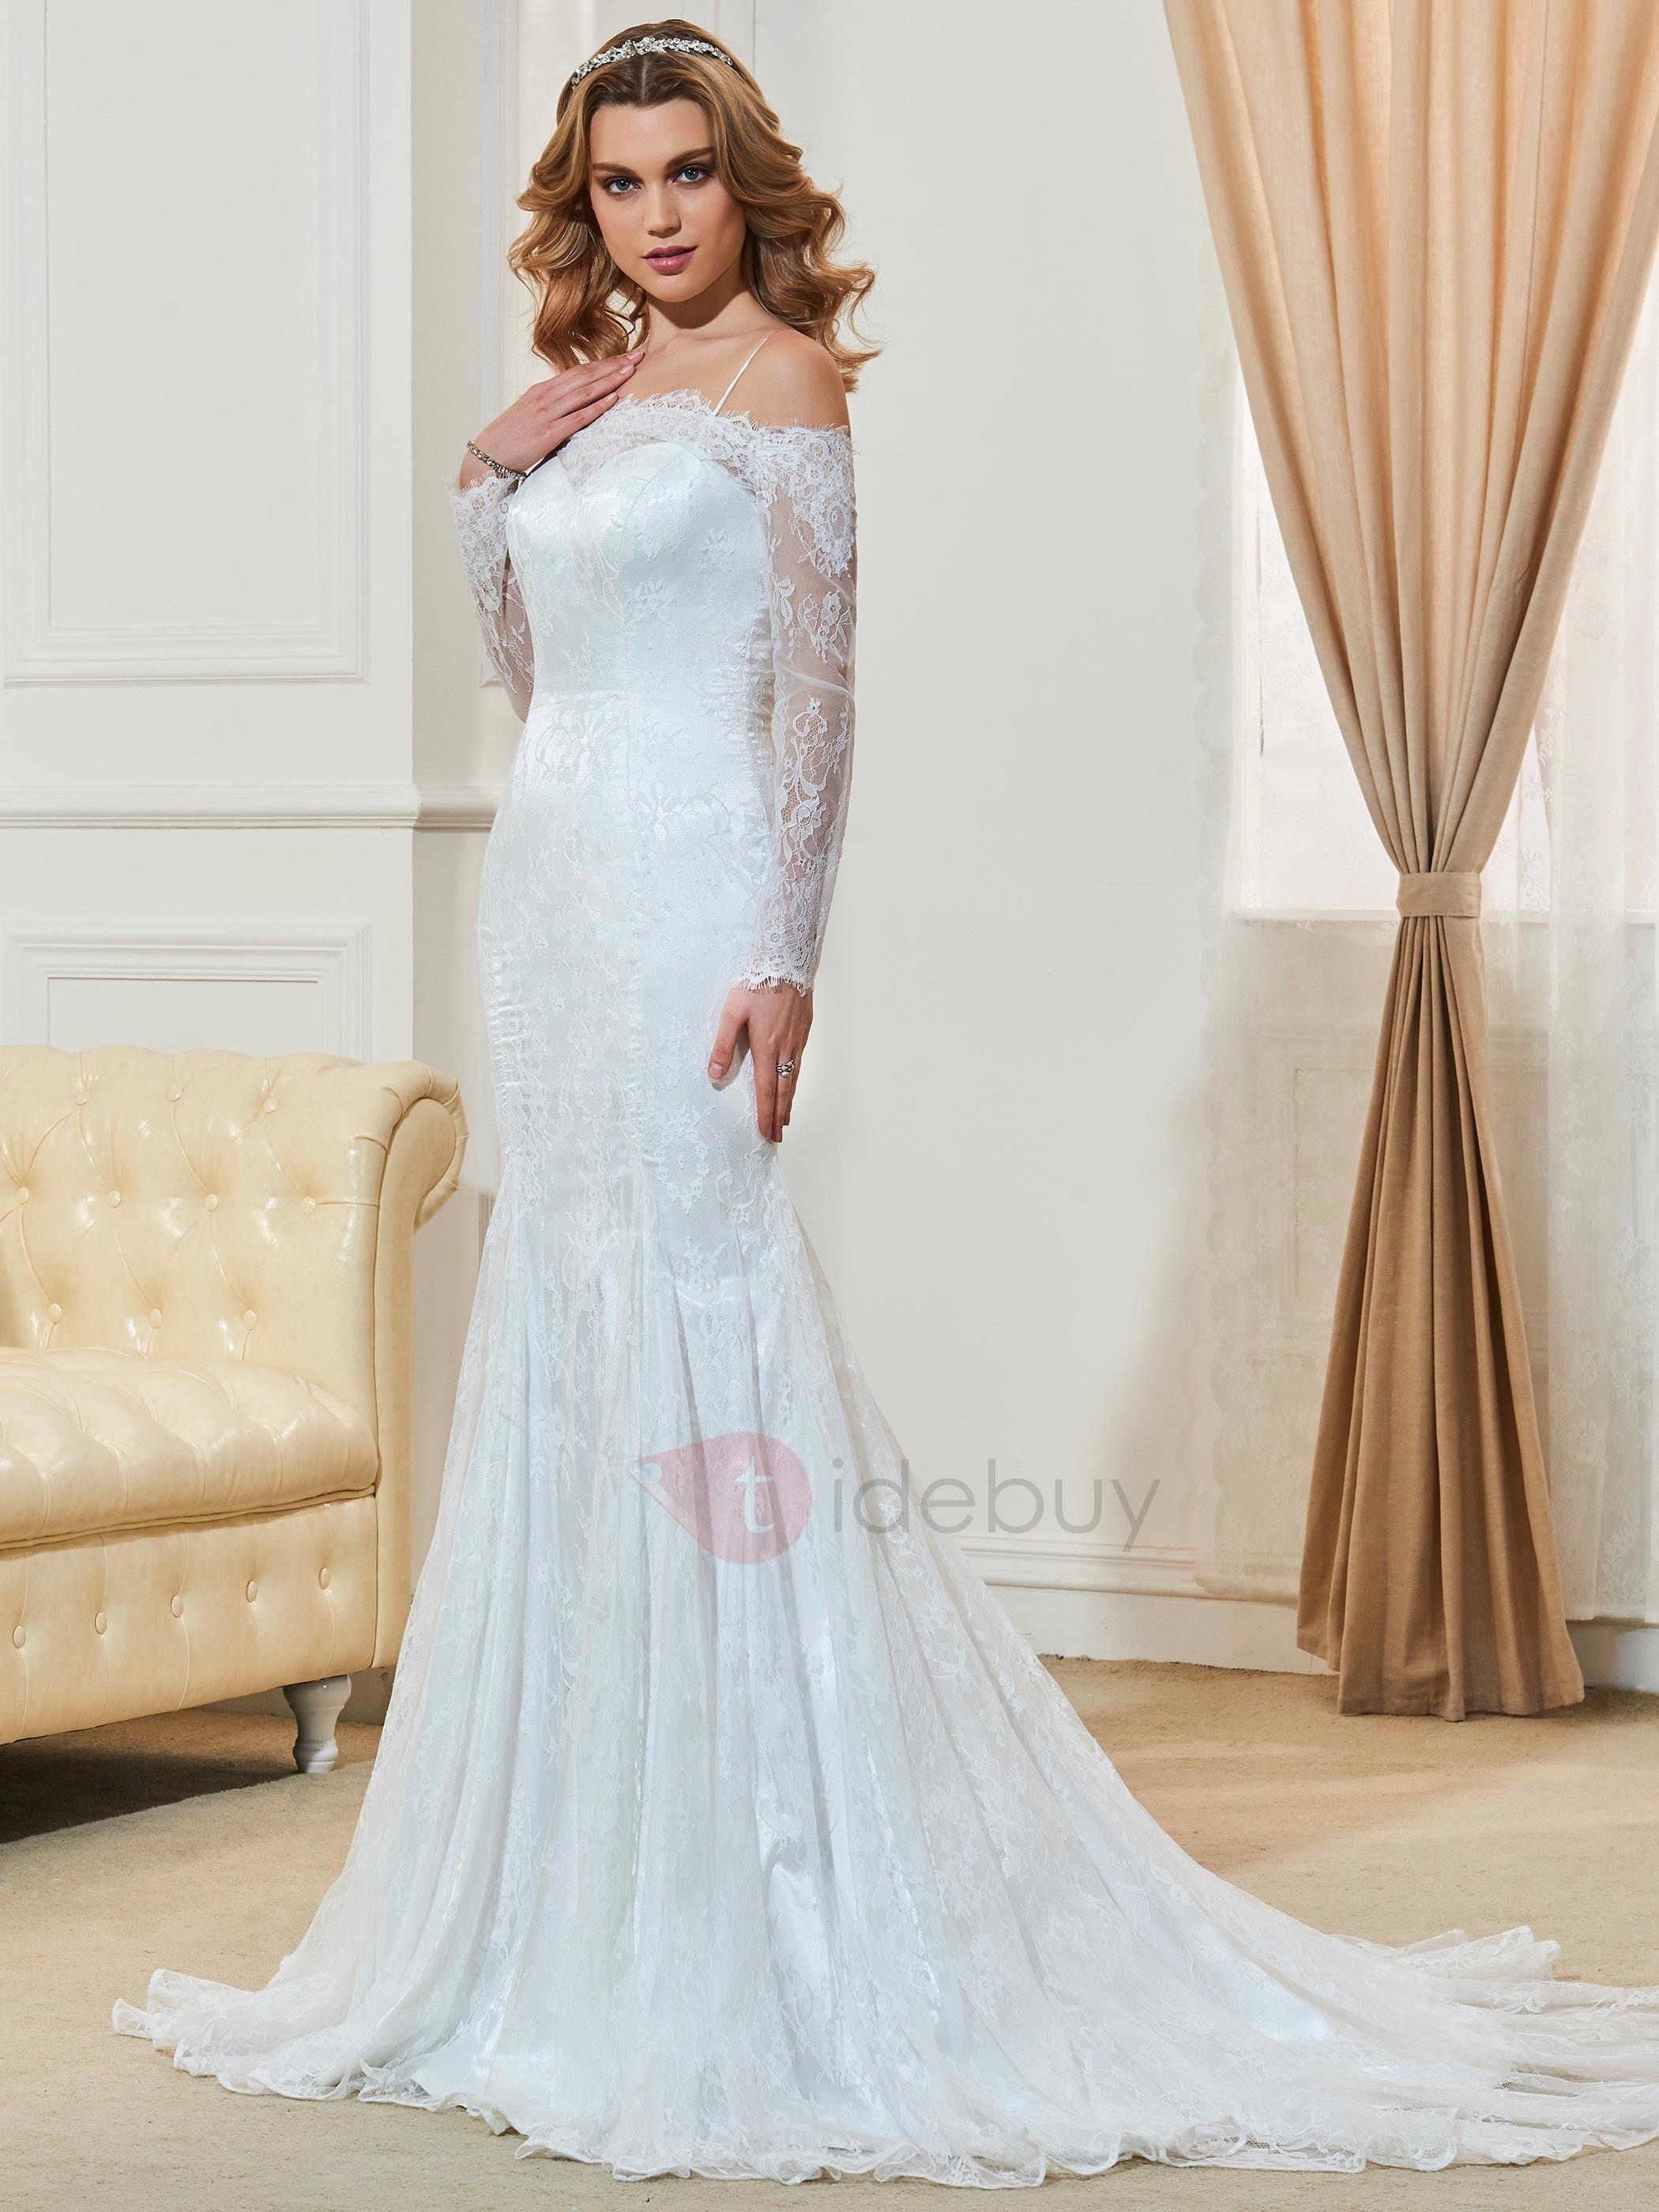 Off the Shoulder Lace Long Sleeves Mermaid Wedding Dress  Wedding